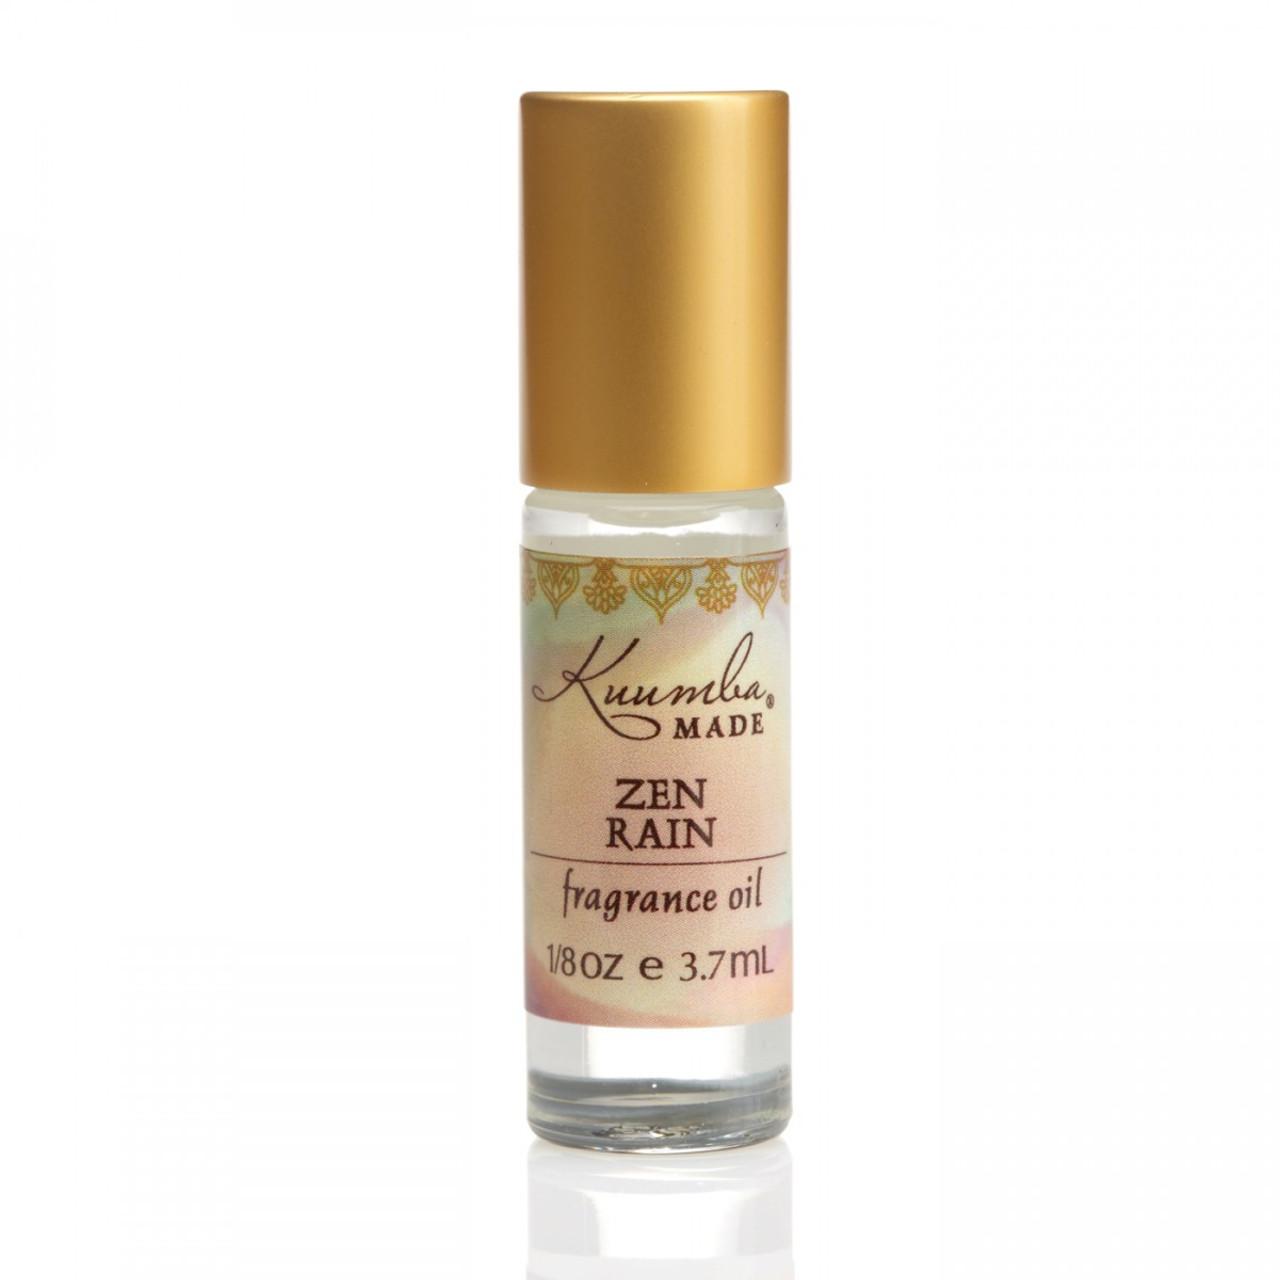 Kuumba Made Zen Rain Fragrance Oil